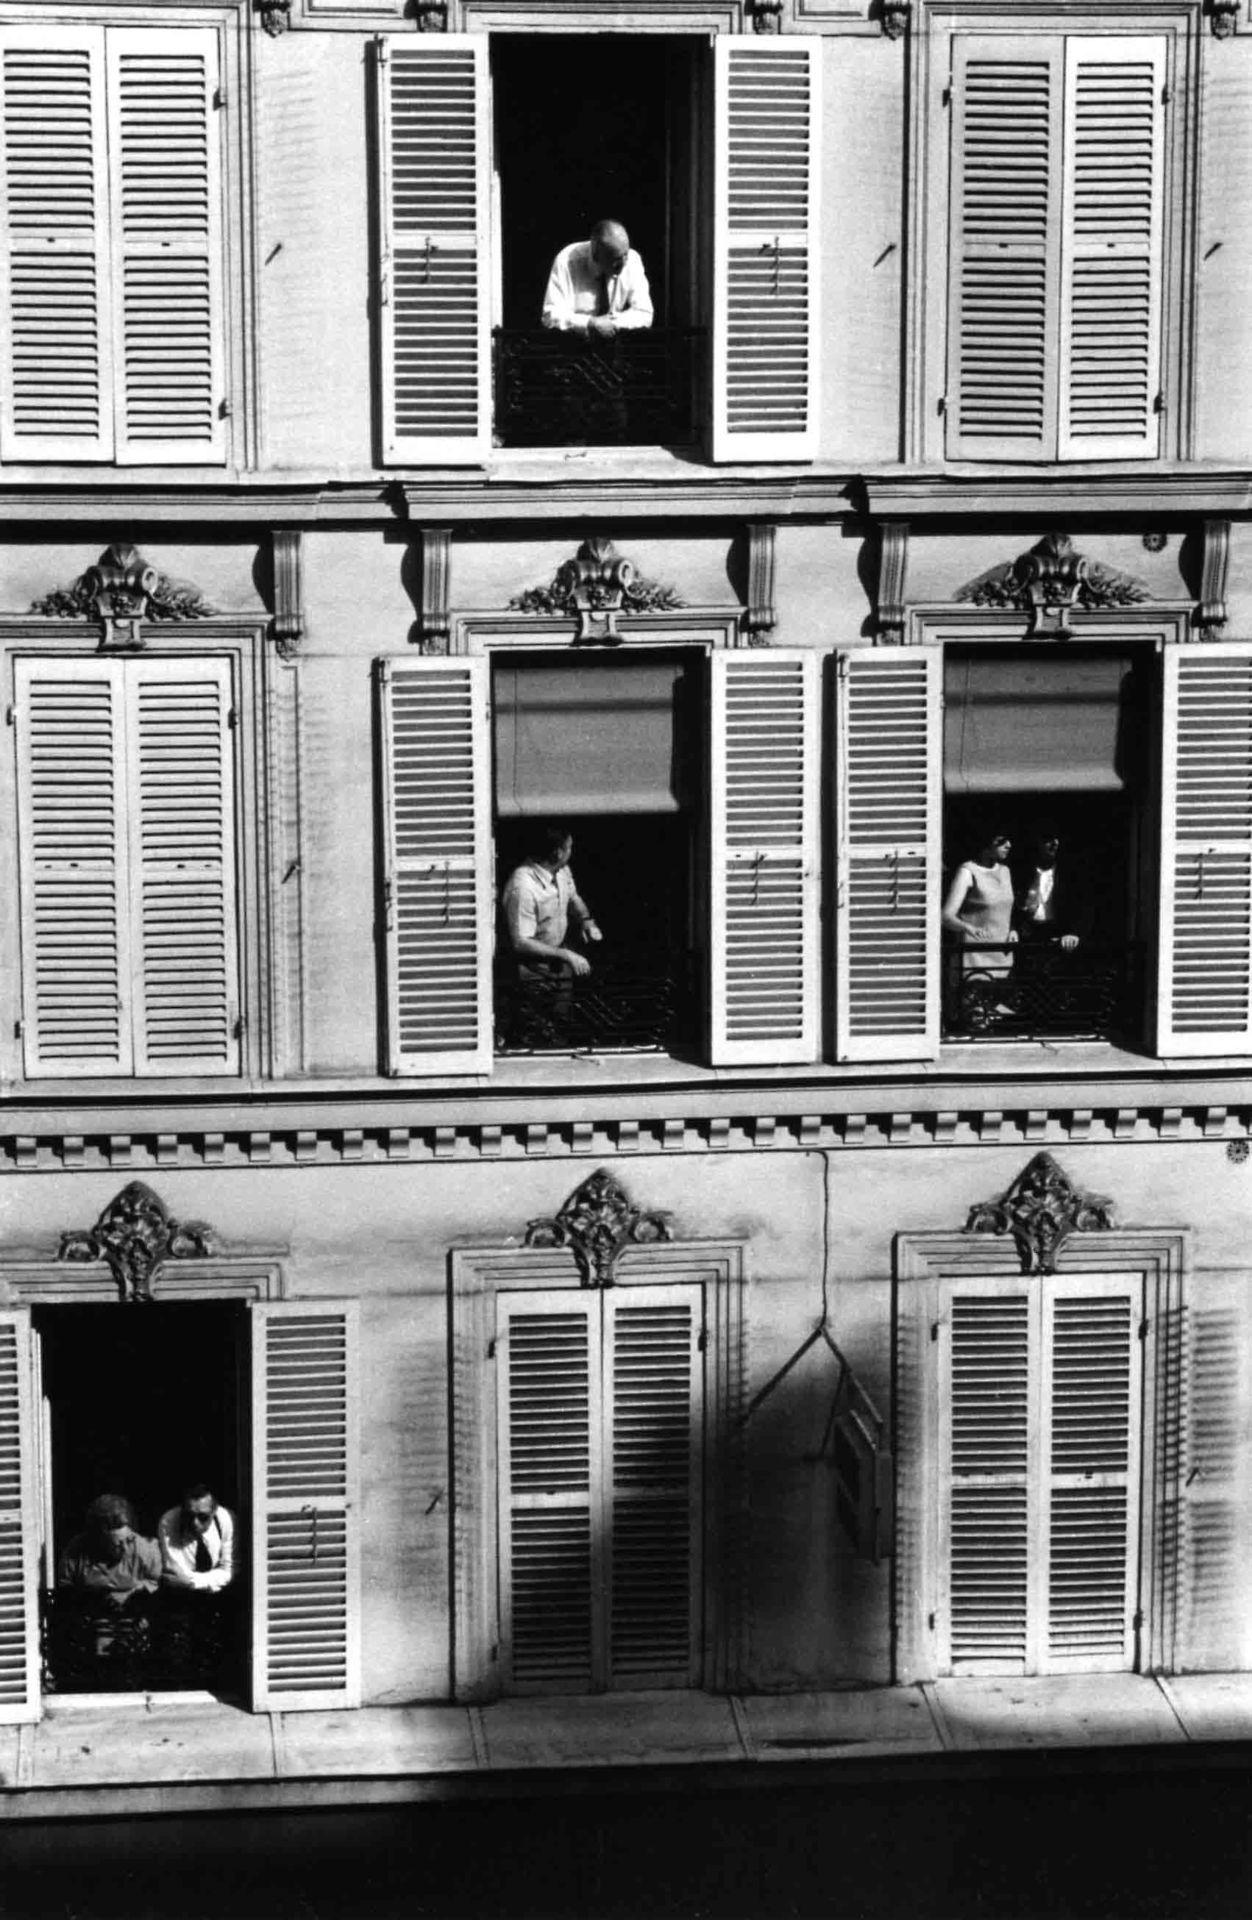 Édouard Boubat, Quartier Latin, Paris, 1968